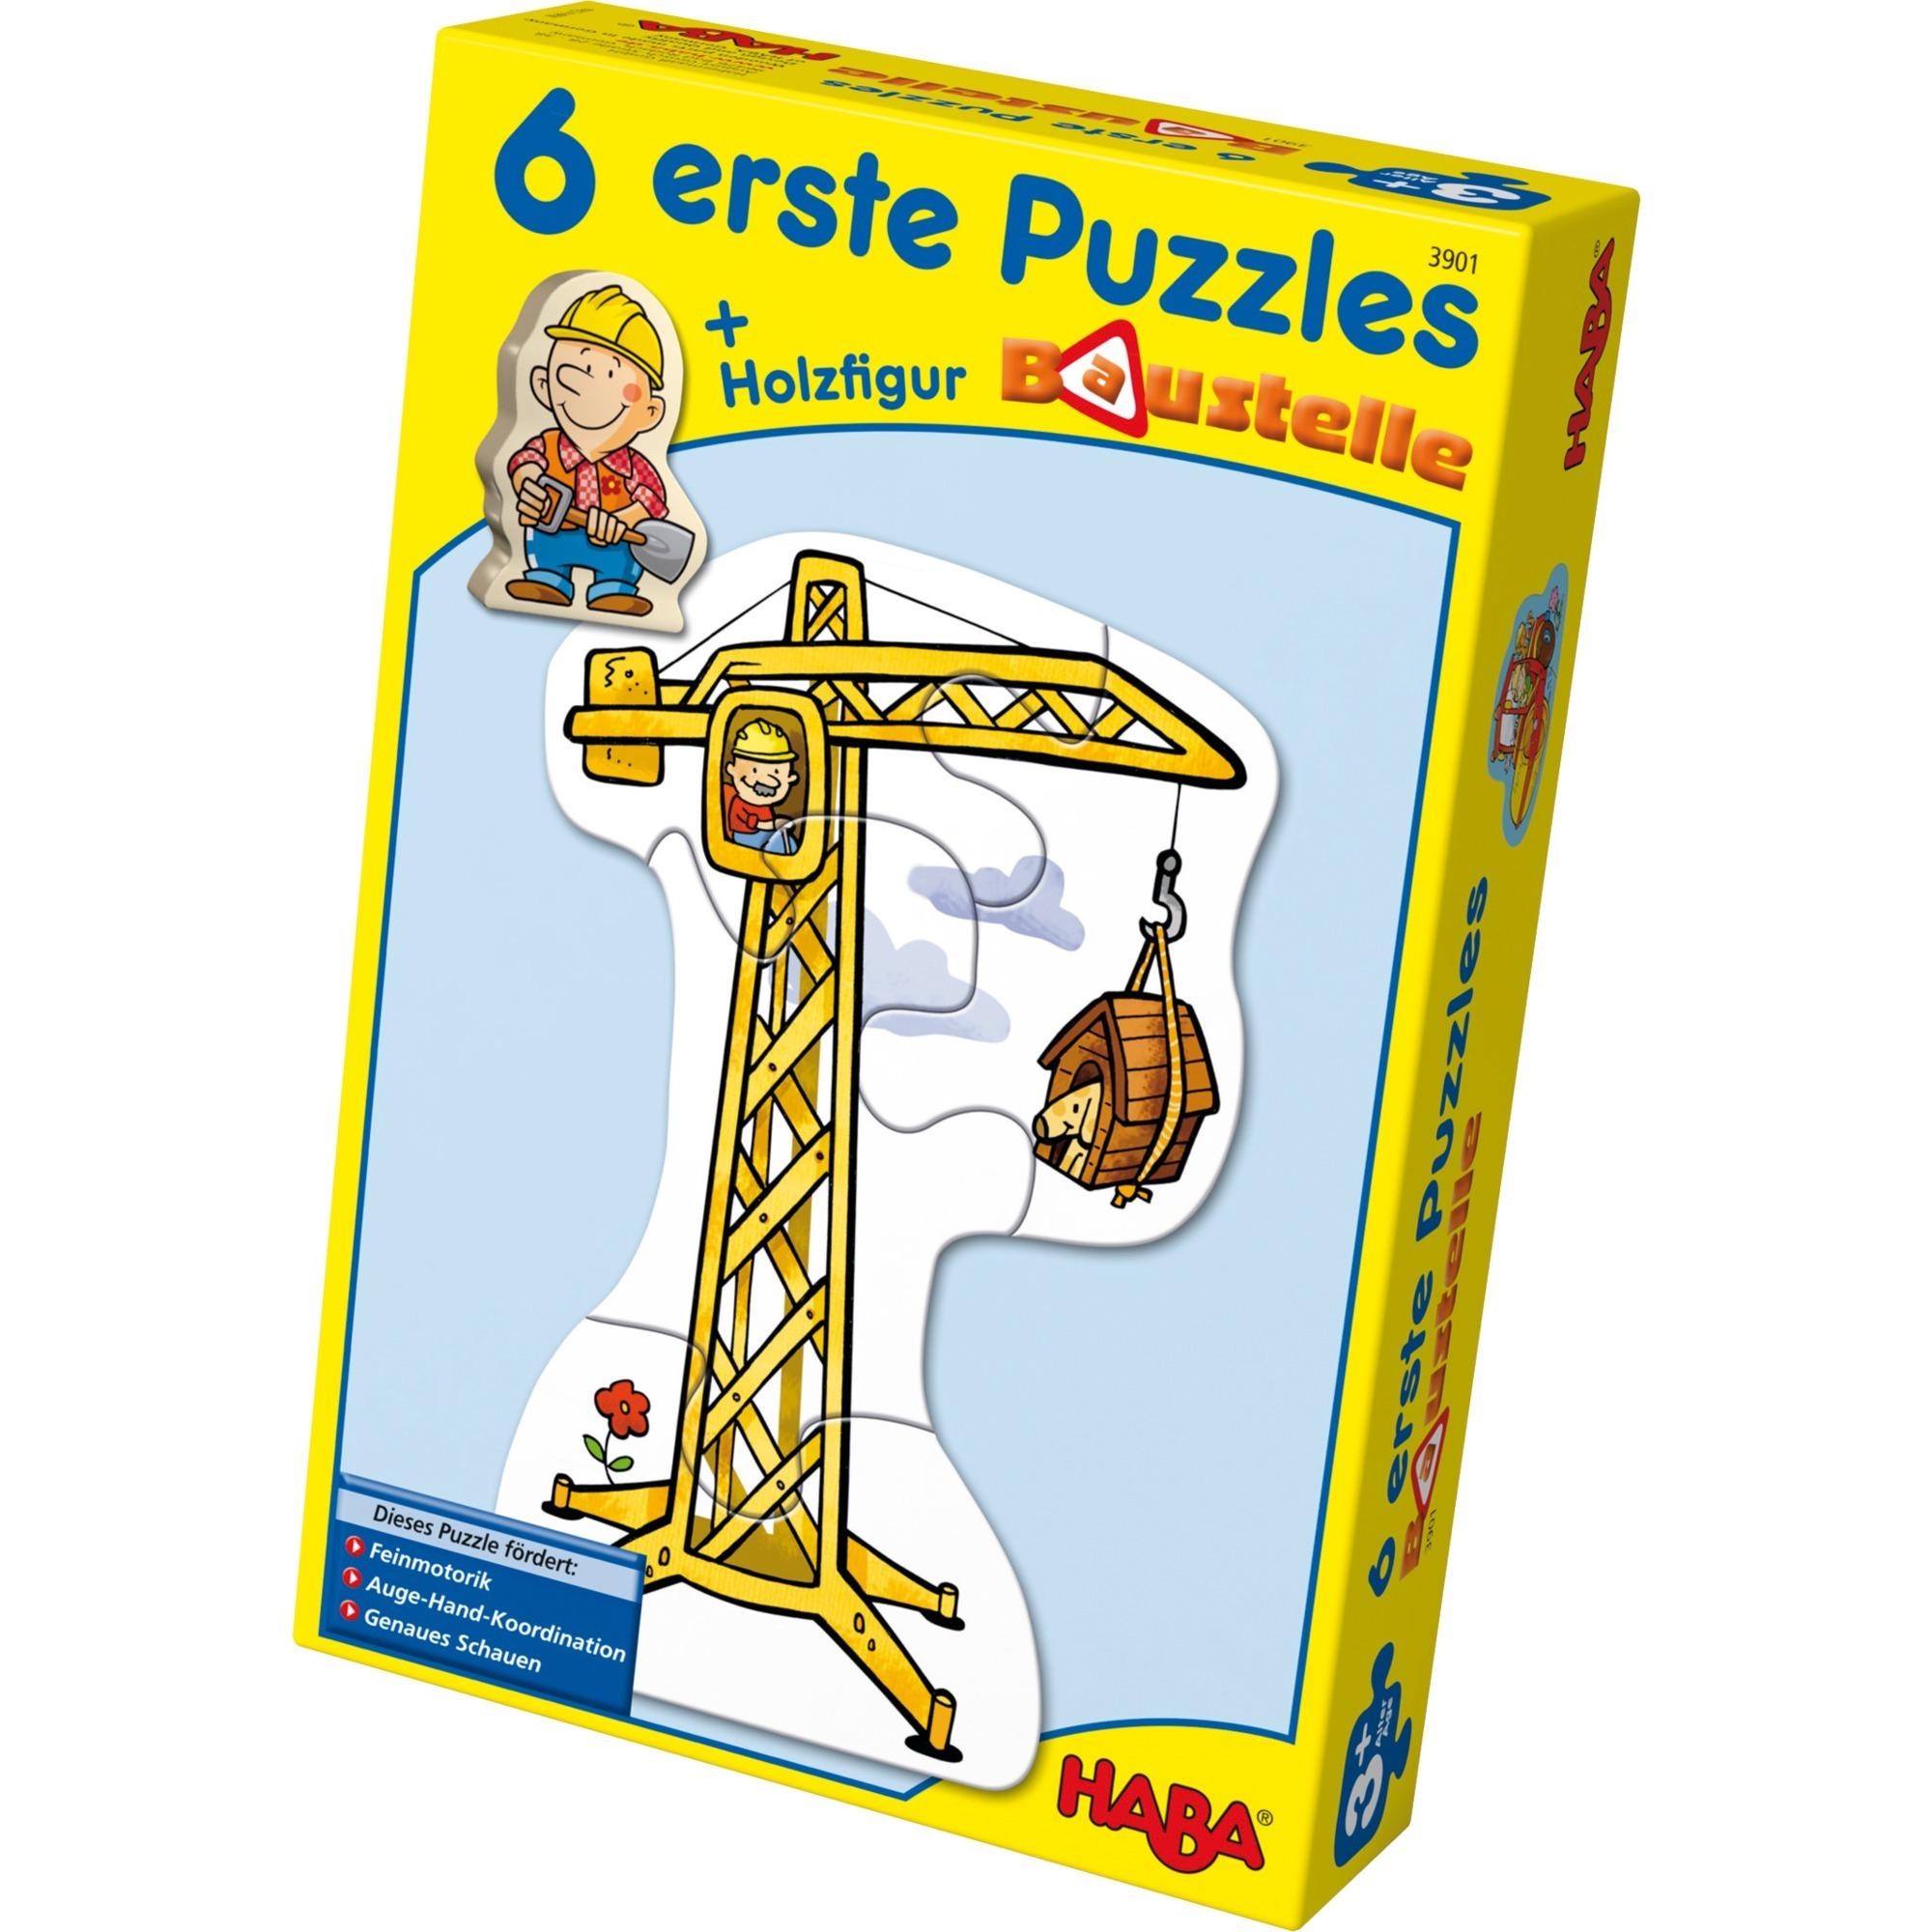 003901 Puzzle rompecabezas 18 pieza(s)